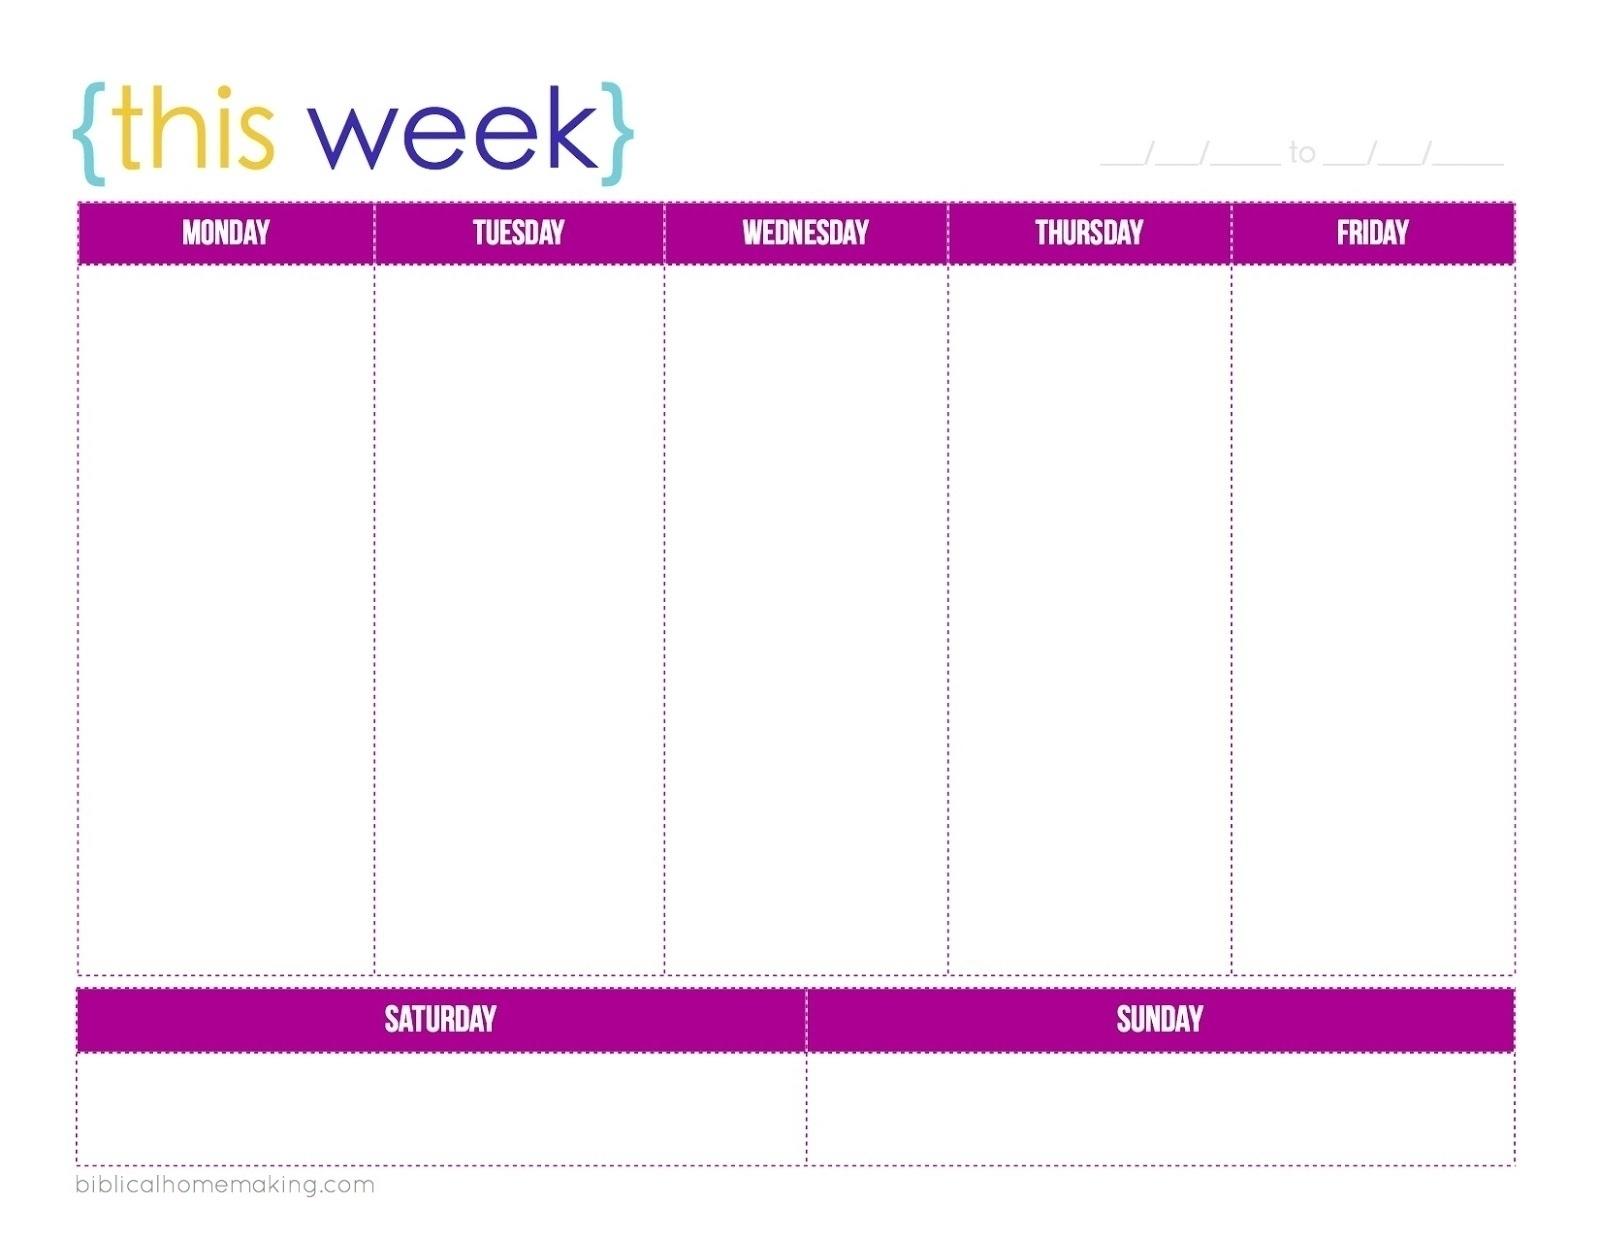 Blank 5 Day Calendar Printable | Template Calendar Printable intended for 5 Day Week Calendar Template